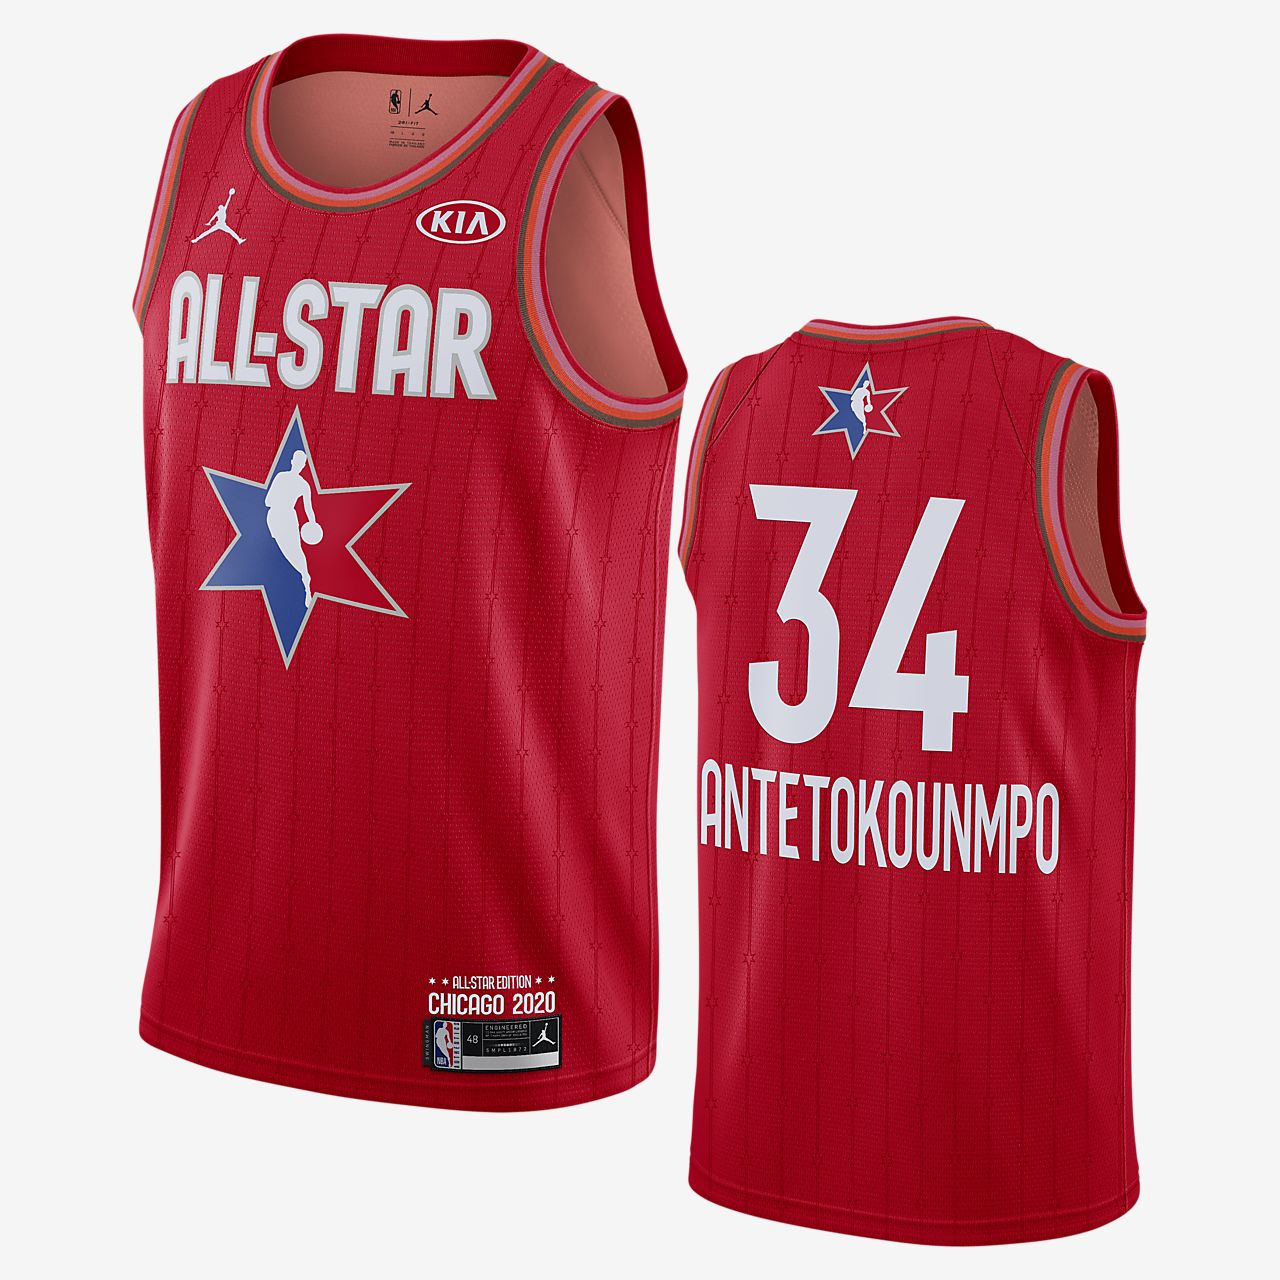 Giannis Antetokounmpo All-Star Jordan NBA Swingman Jersey